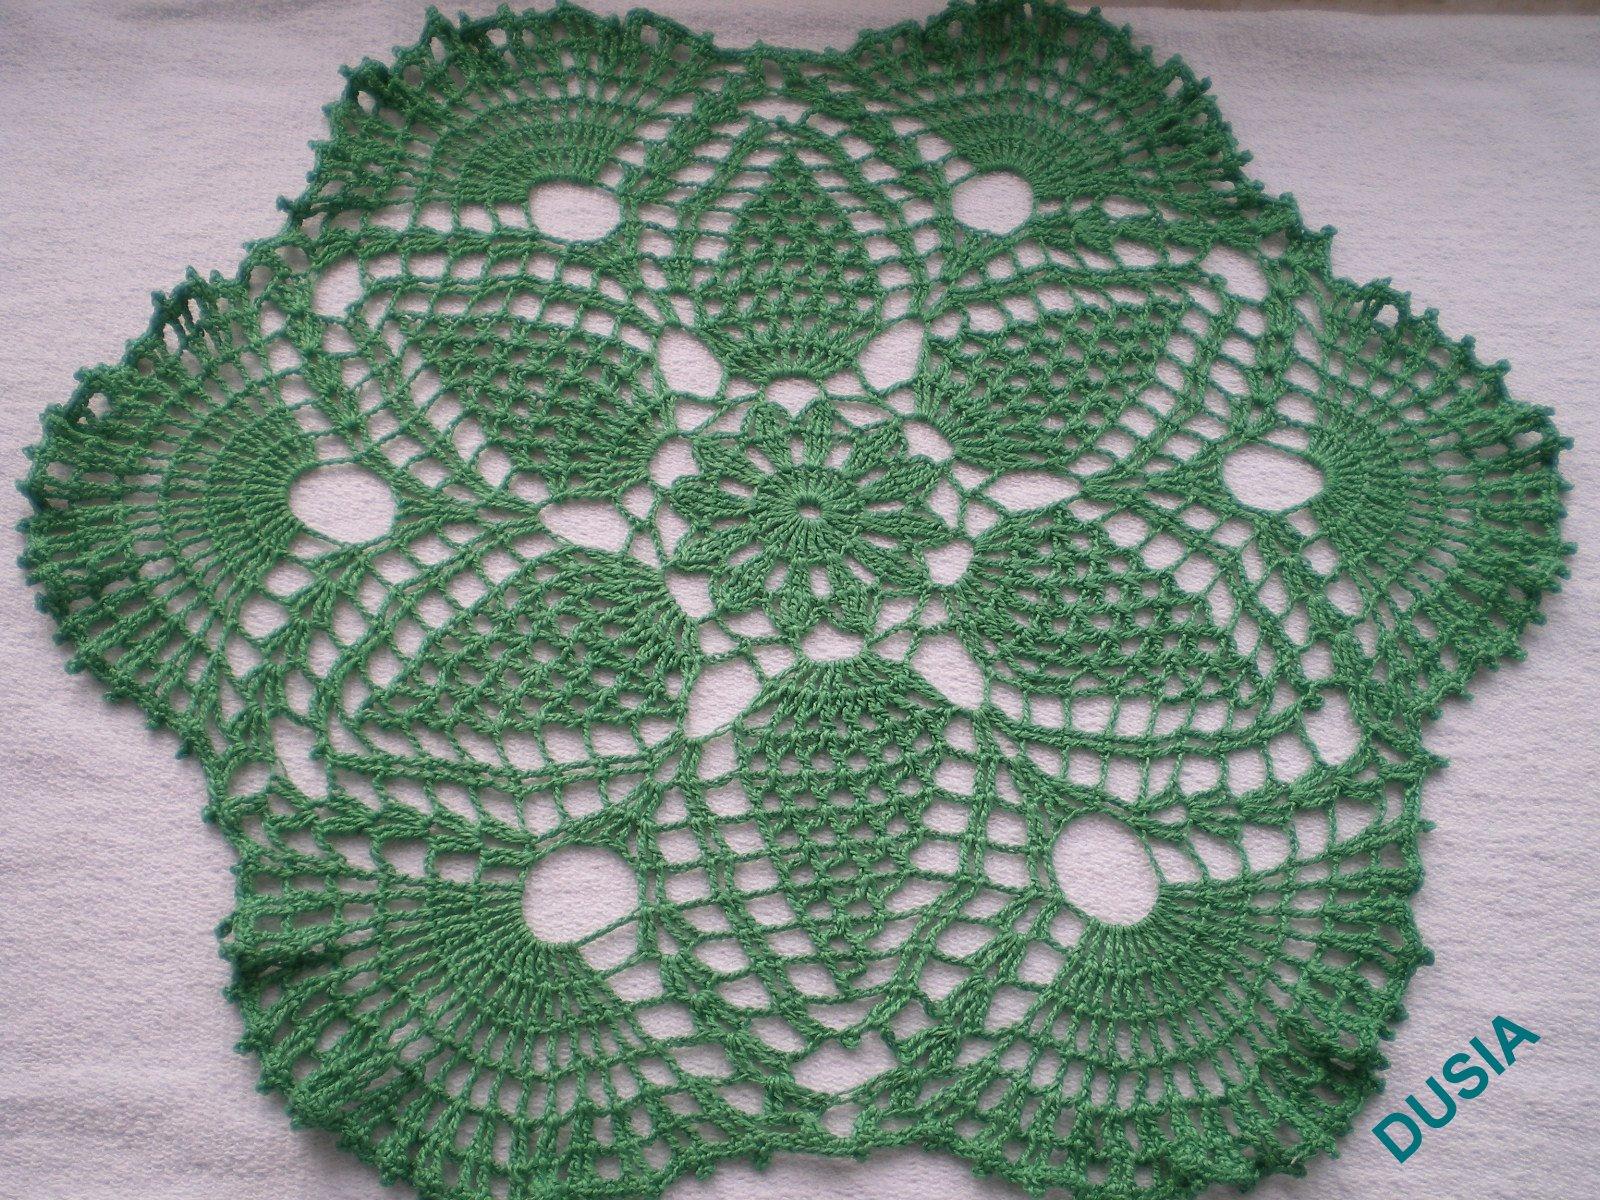 Serweta zielona